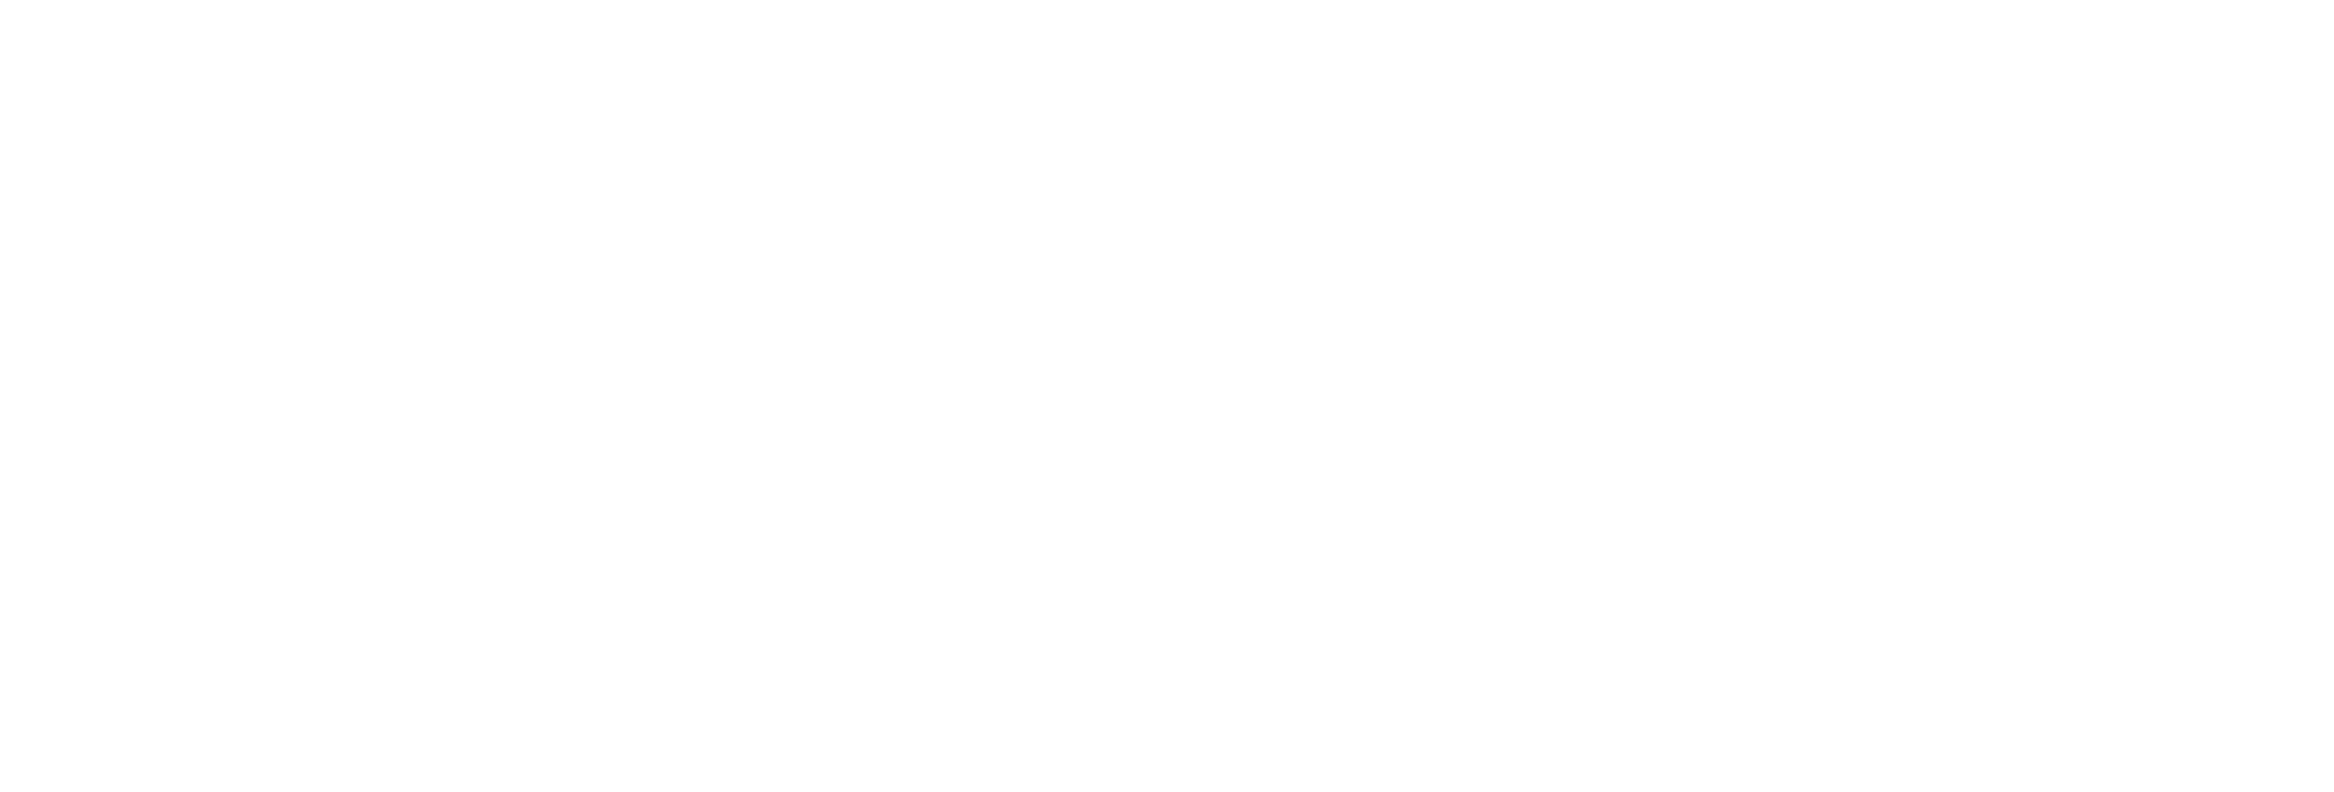 Acosta_logo_white.png